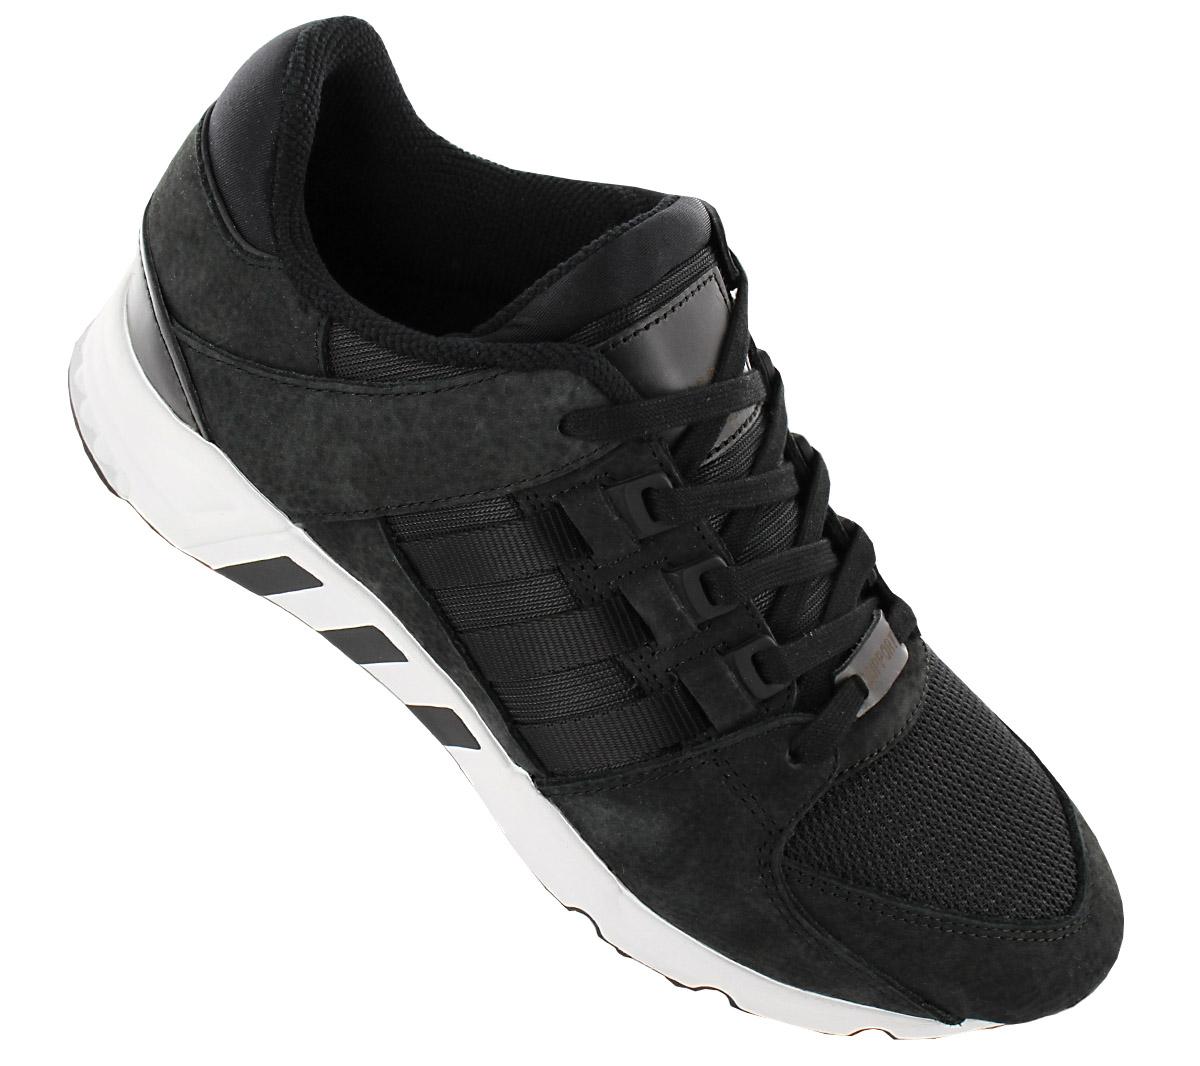 factory price 4c2f3 794b4 Adidas Originals Eqt Equipment Support RF Trainers Shoes BB1